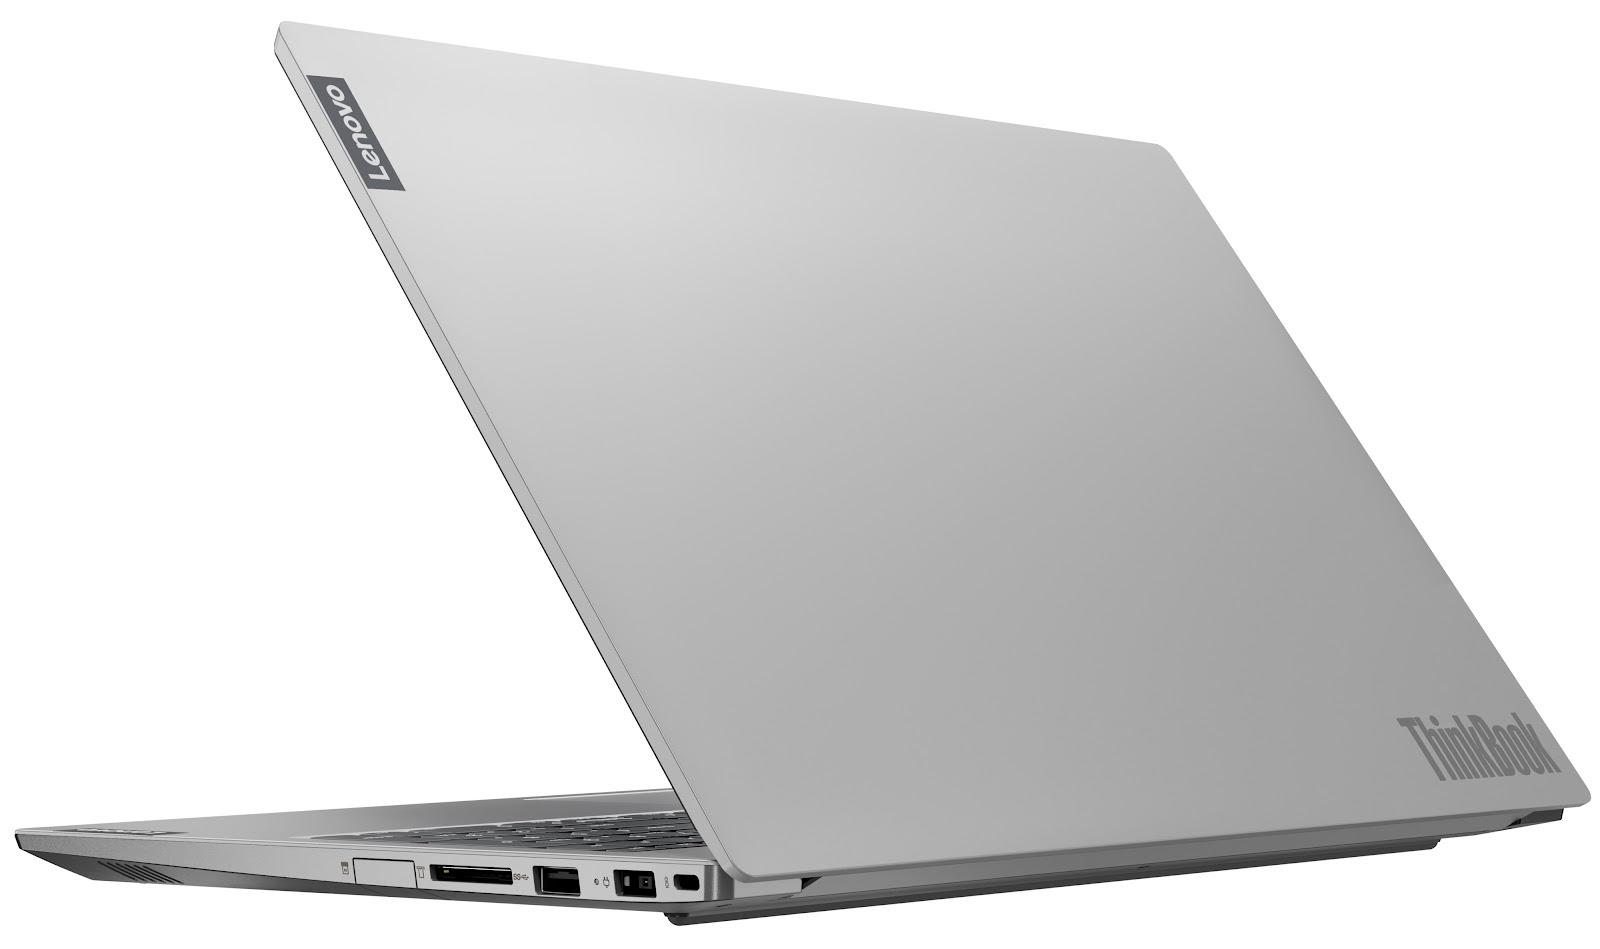 Фото 1. Ноутбук Lenovo ThinkBook 15-IIL (20SM0042RU)